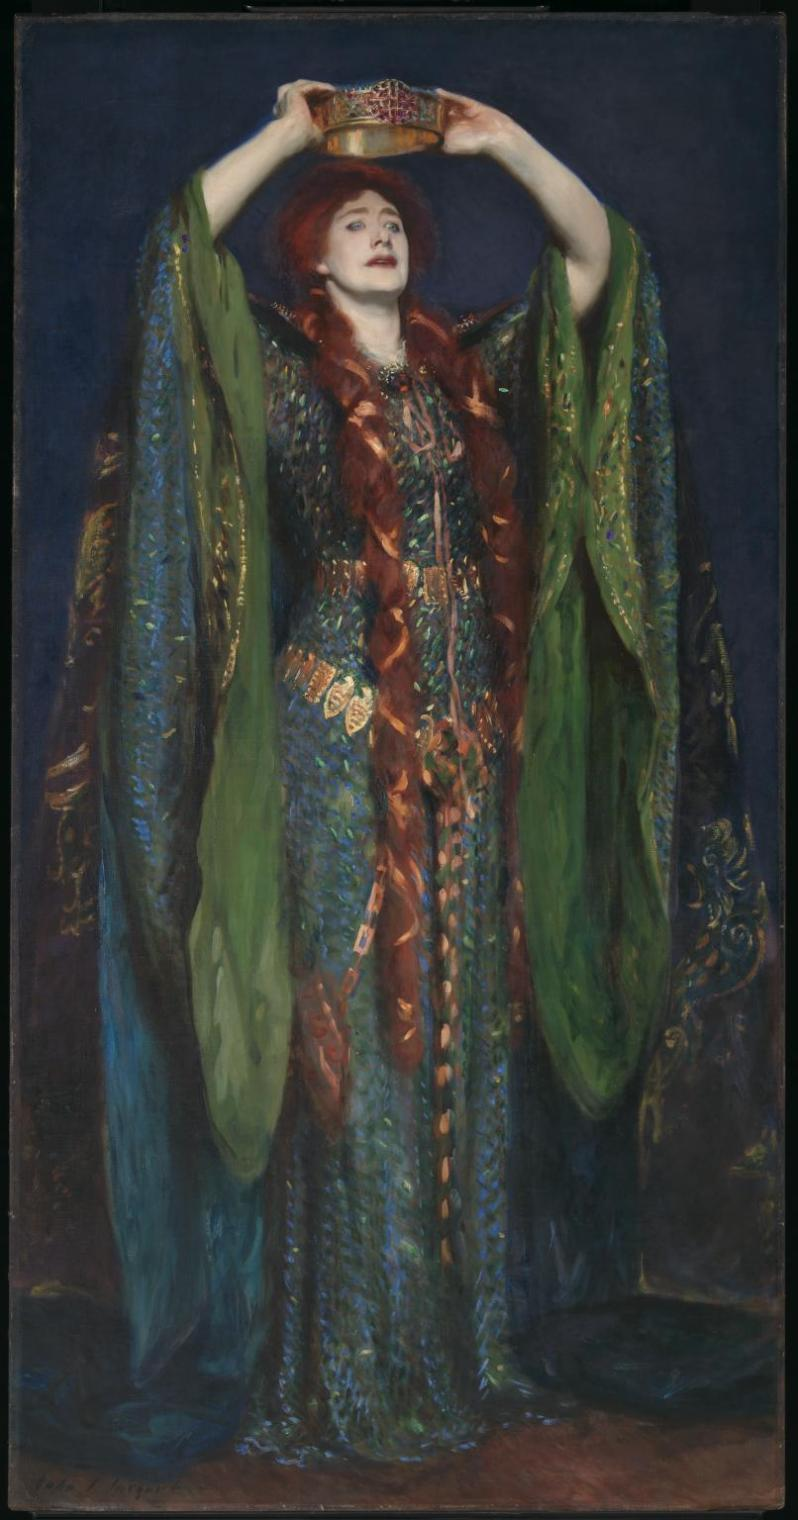 John Singer Sargent, Ellen Terry as Lady Macbeth, 1889